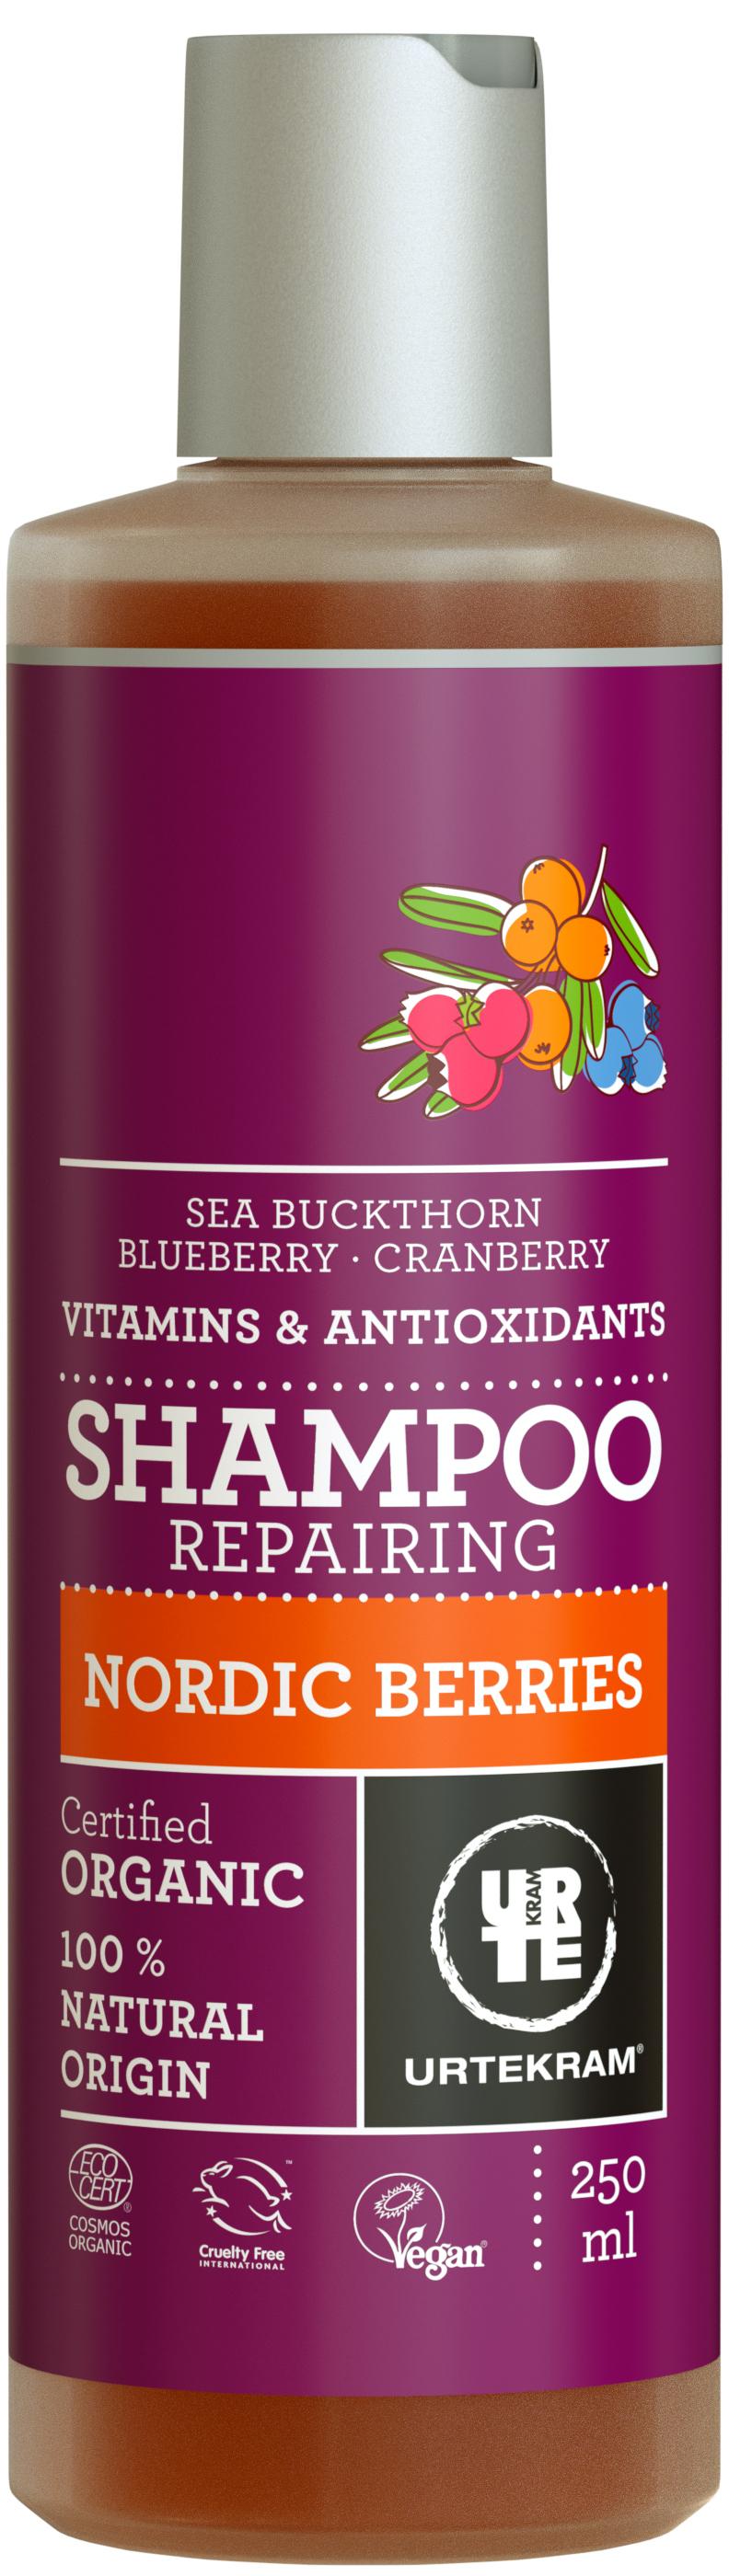 Urtekram Nordic Berries Shampoo – winner of Vivaness Best New Hair Product of the Year Award 2017 (Photo: Business Wire)